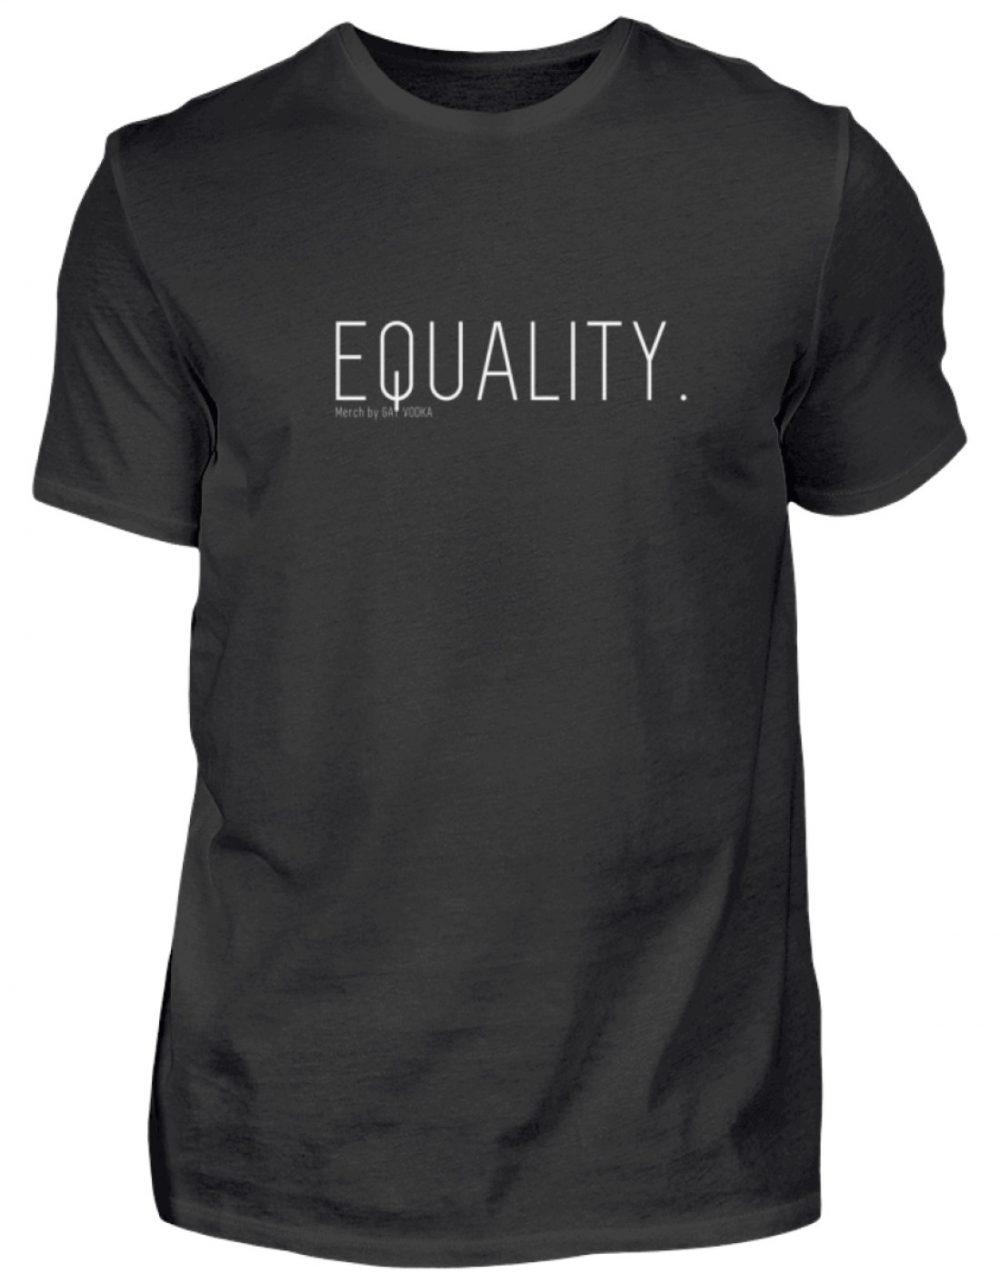 EQUALITY. - Herren Premiumshirt-16